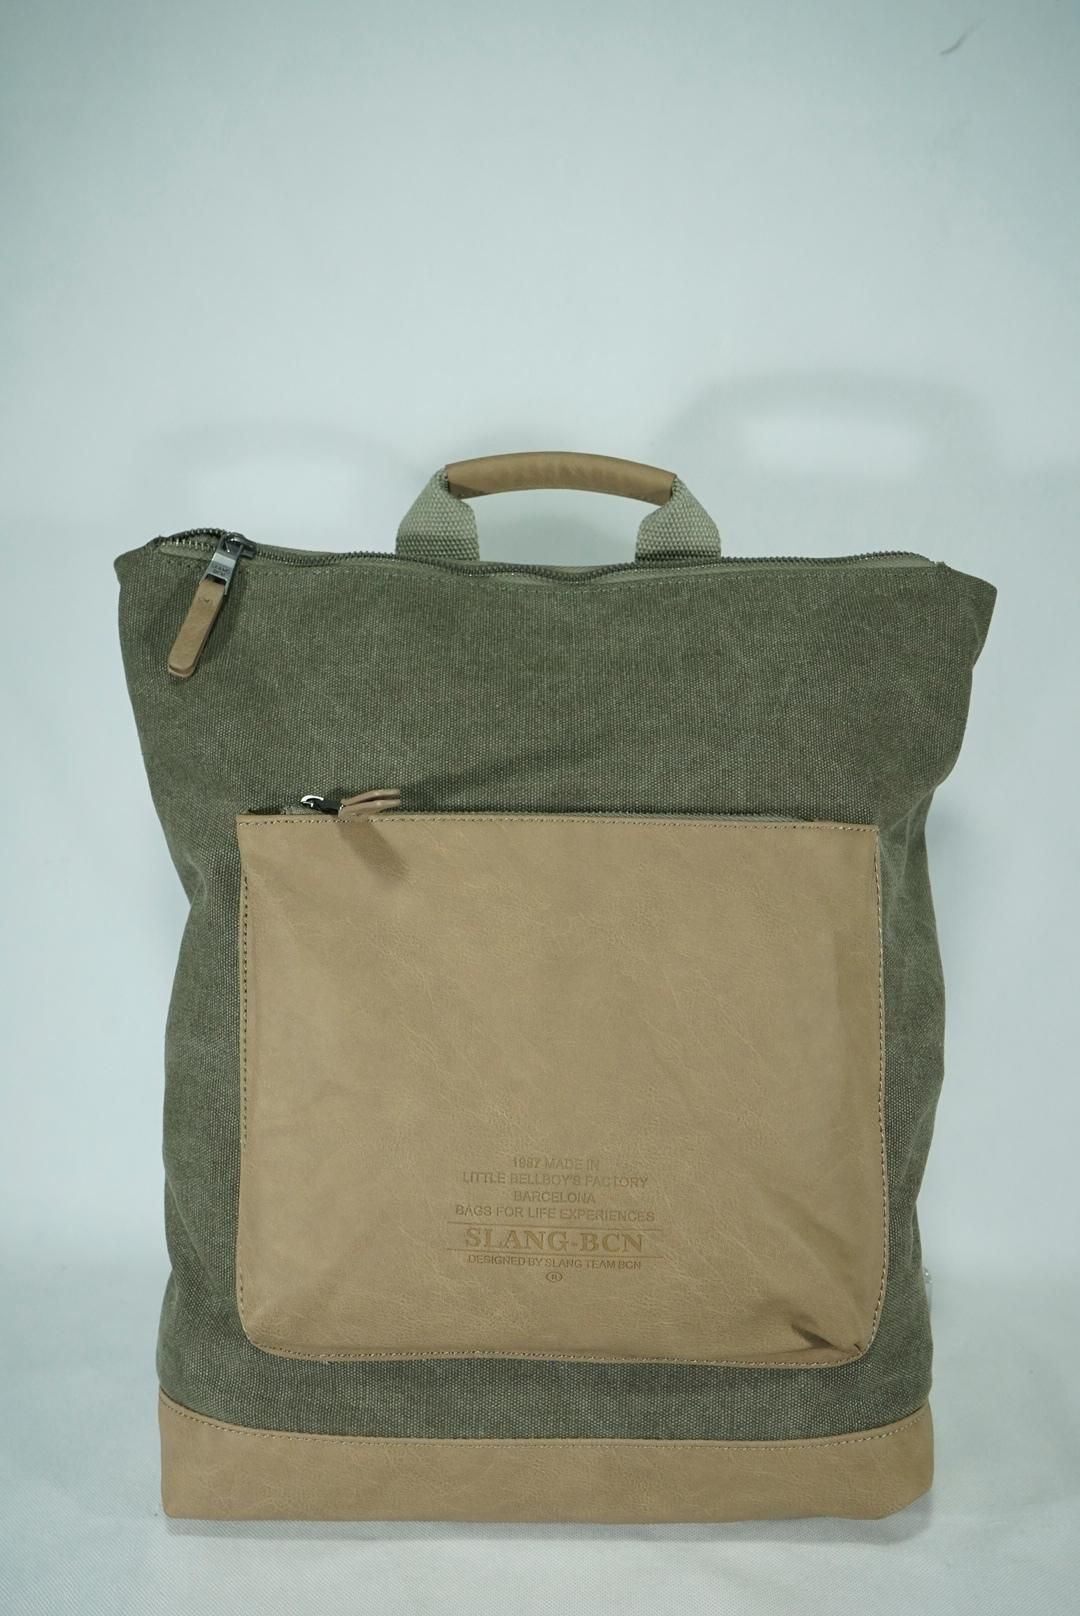 8dc802c5b Comprar Bolso Mochila S Slang SIROCO RETURN Khaki SI1 49 online ...